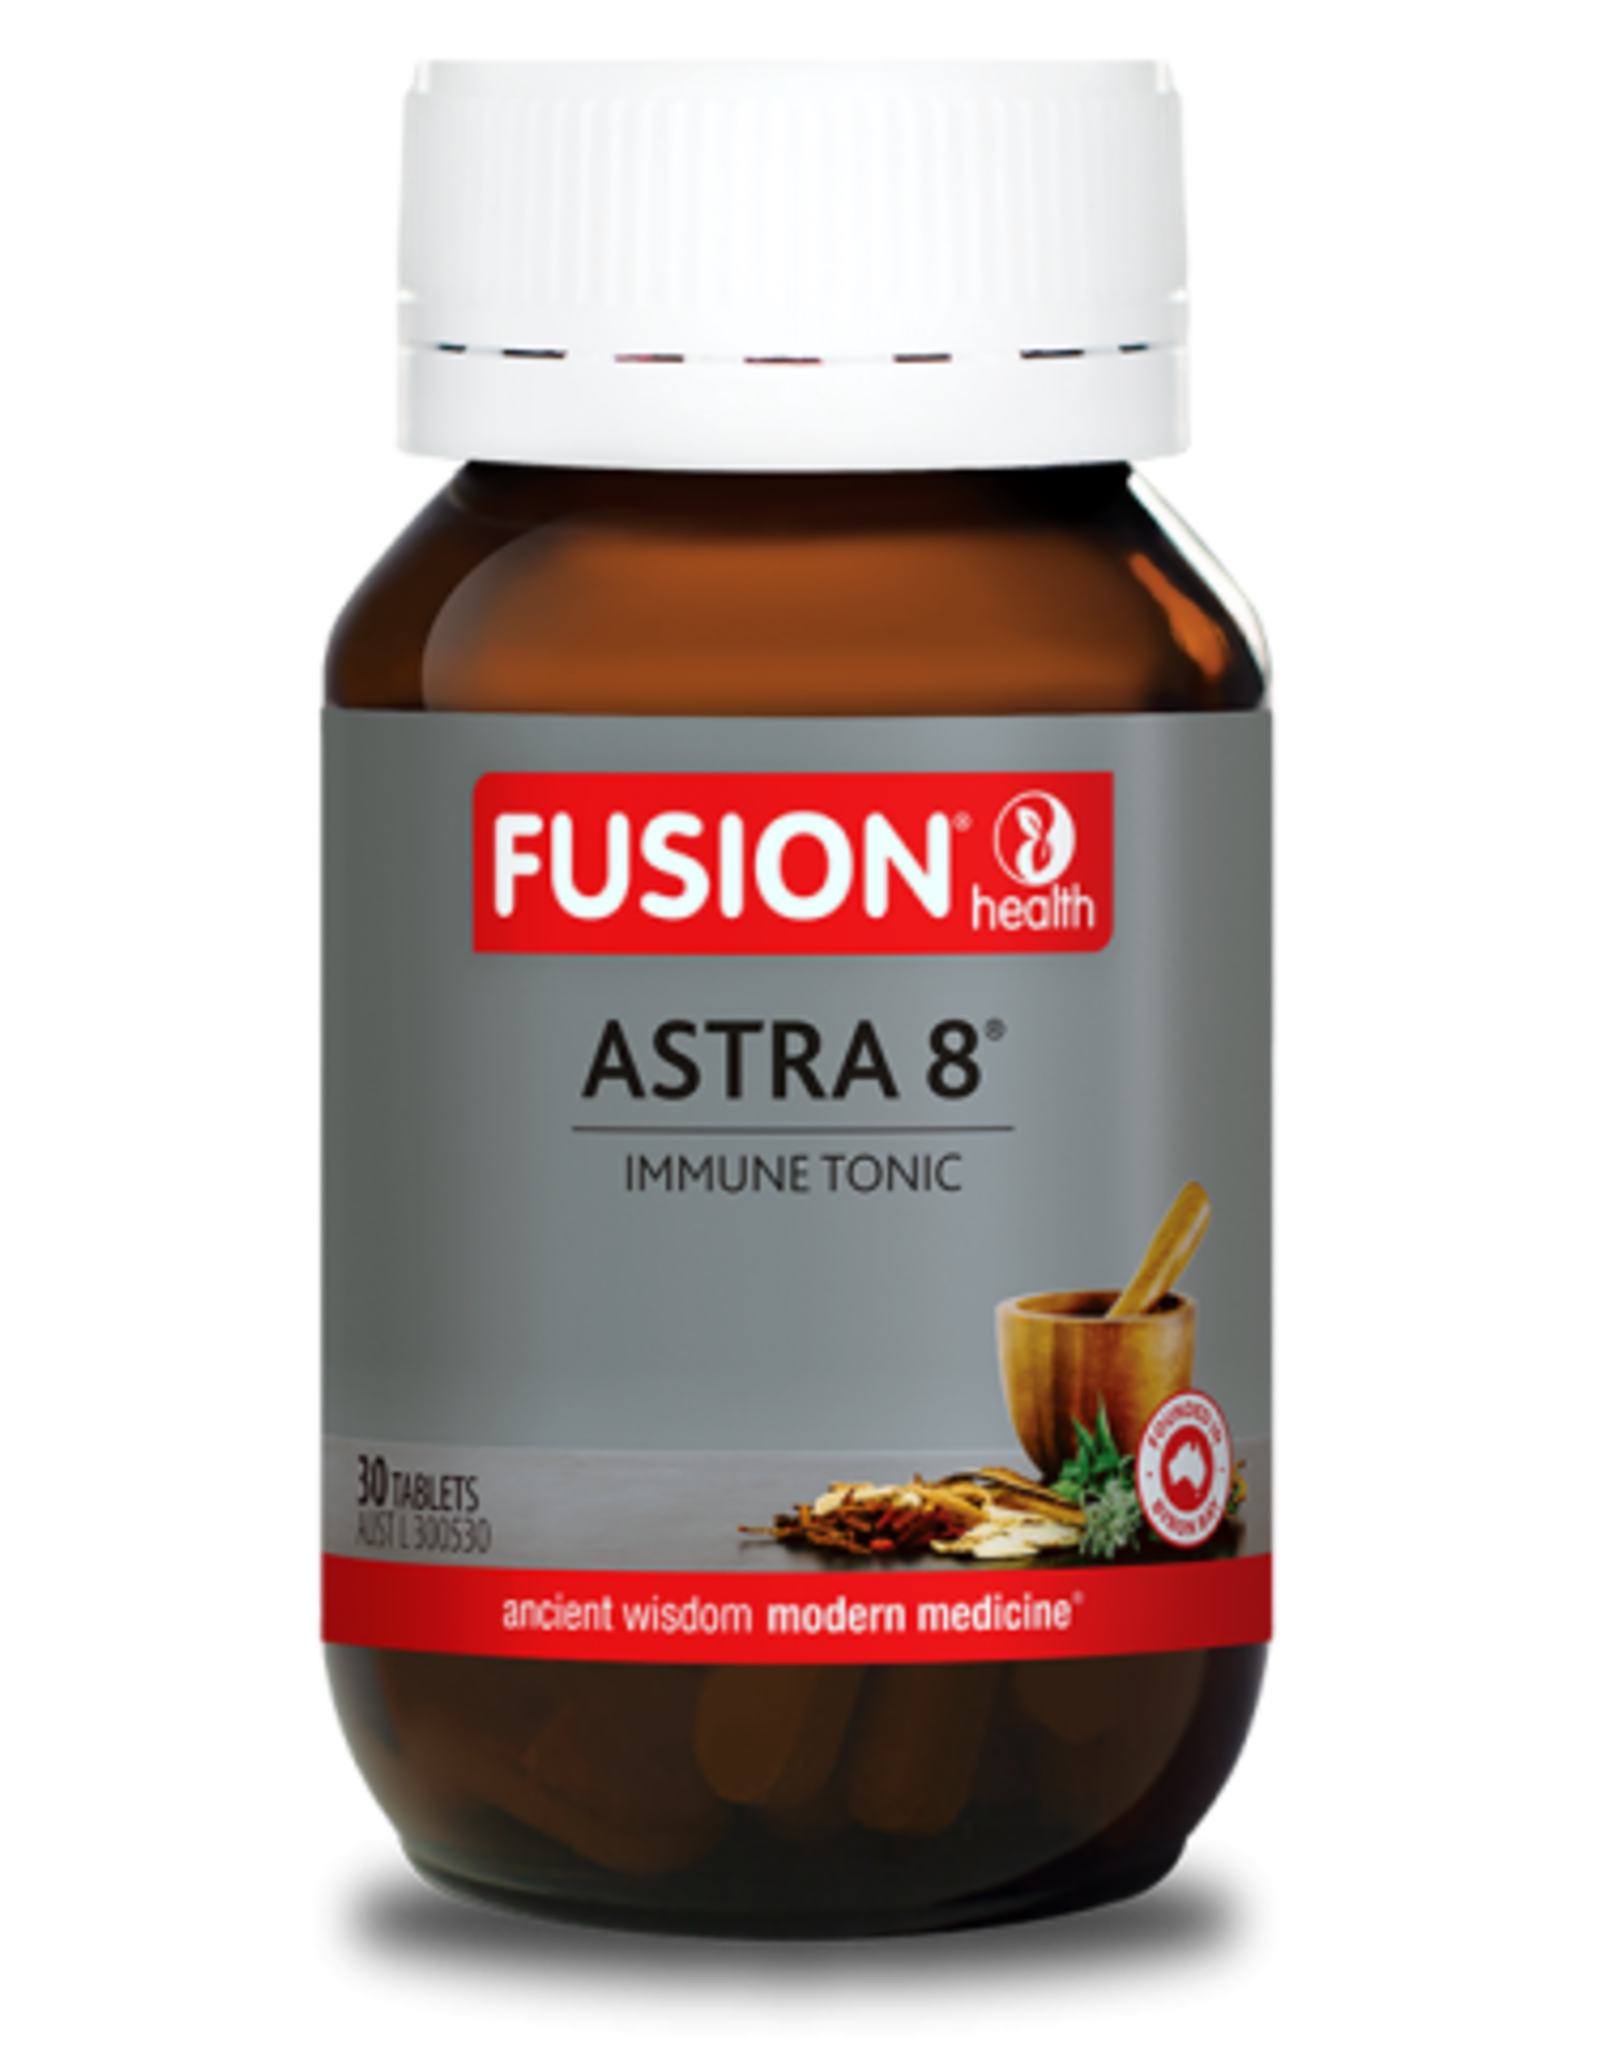 Fusion Astra 8